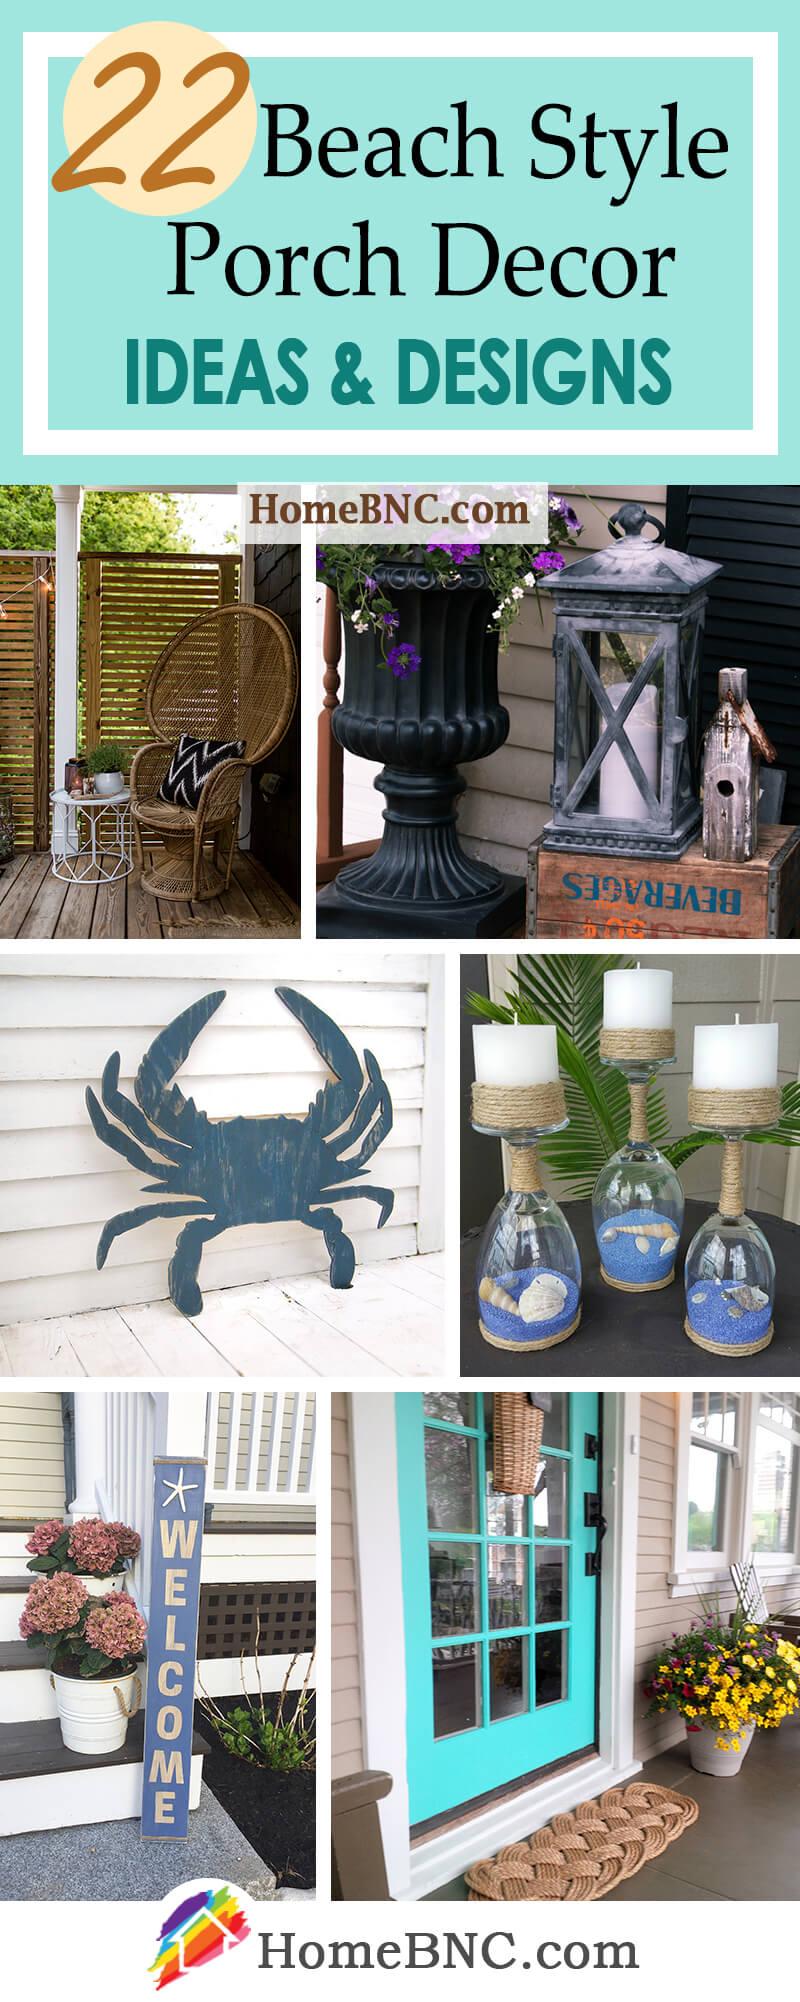 Beach Style Porch Decor Ideas